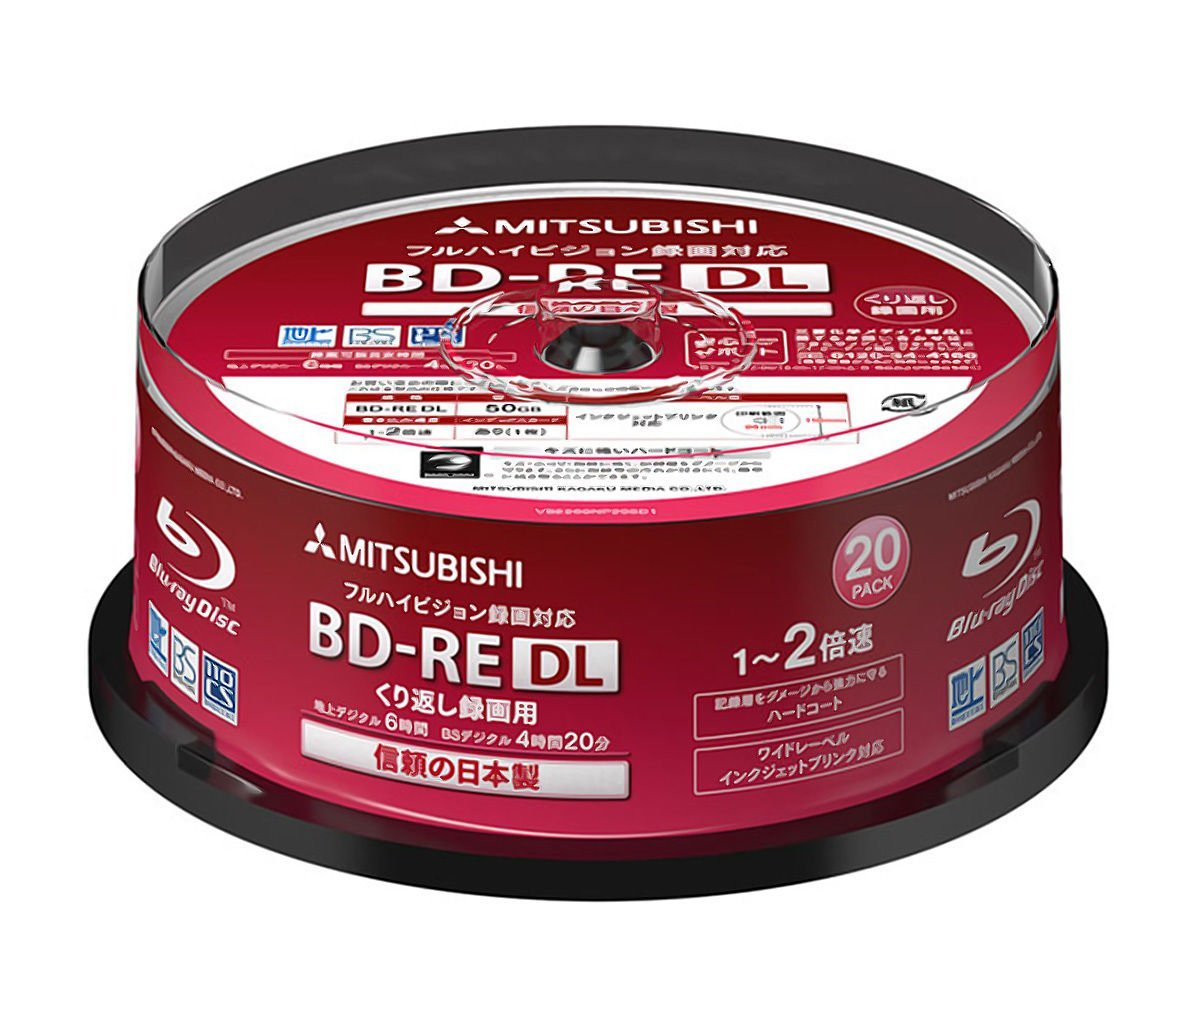 20 Mitsubishi Verbatim Blu Ray Rewritable Disc 50GB BD-RE DL 2x Speed Inkjet Printable Bluray LYSB00IX7CMDA-CMPTRACCS